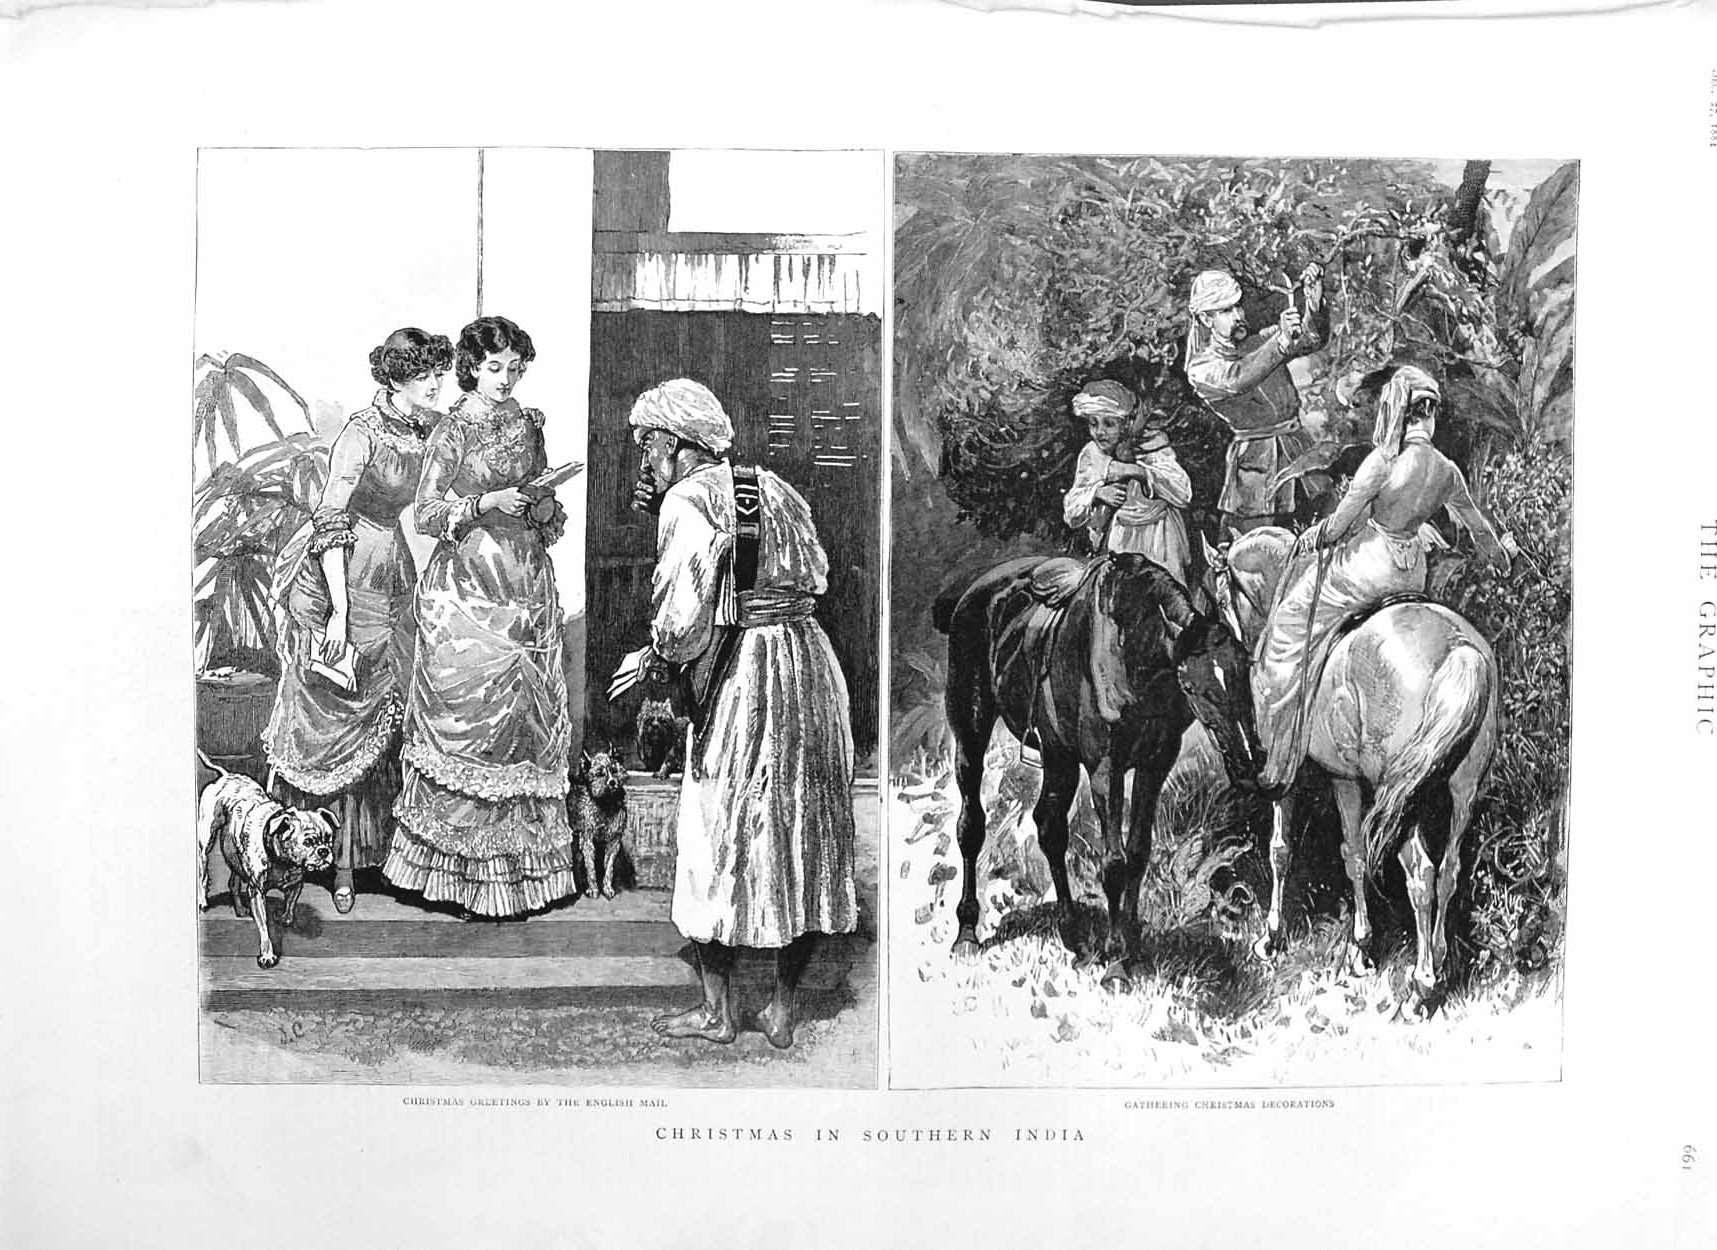 http://www.columbia.edu/itc/mealac/pritchett/00routesdata/1800_1899/britishrule/incountry/graphic1884.jpg